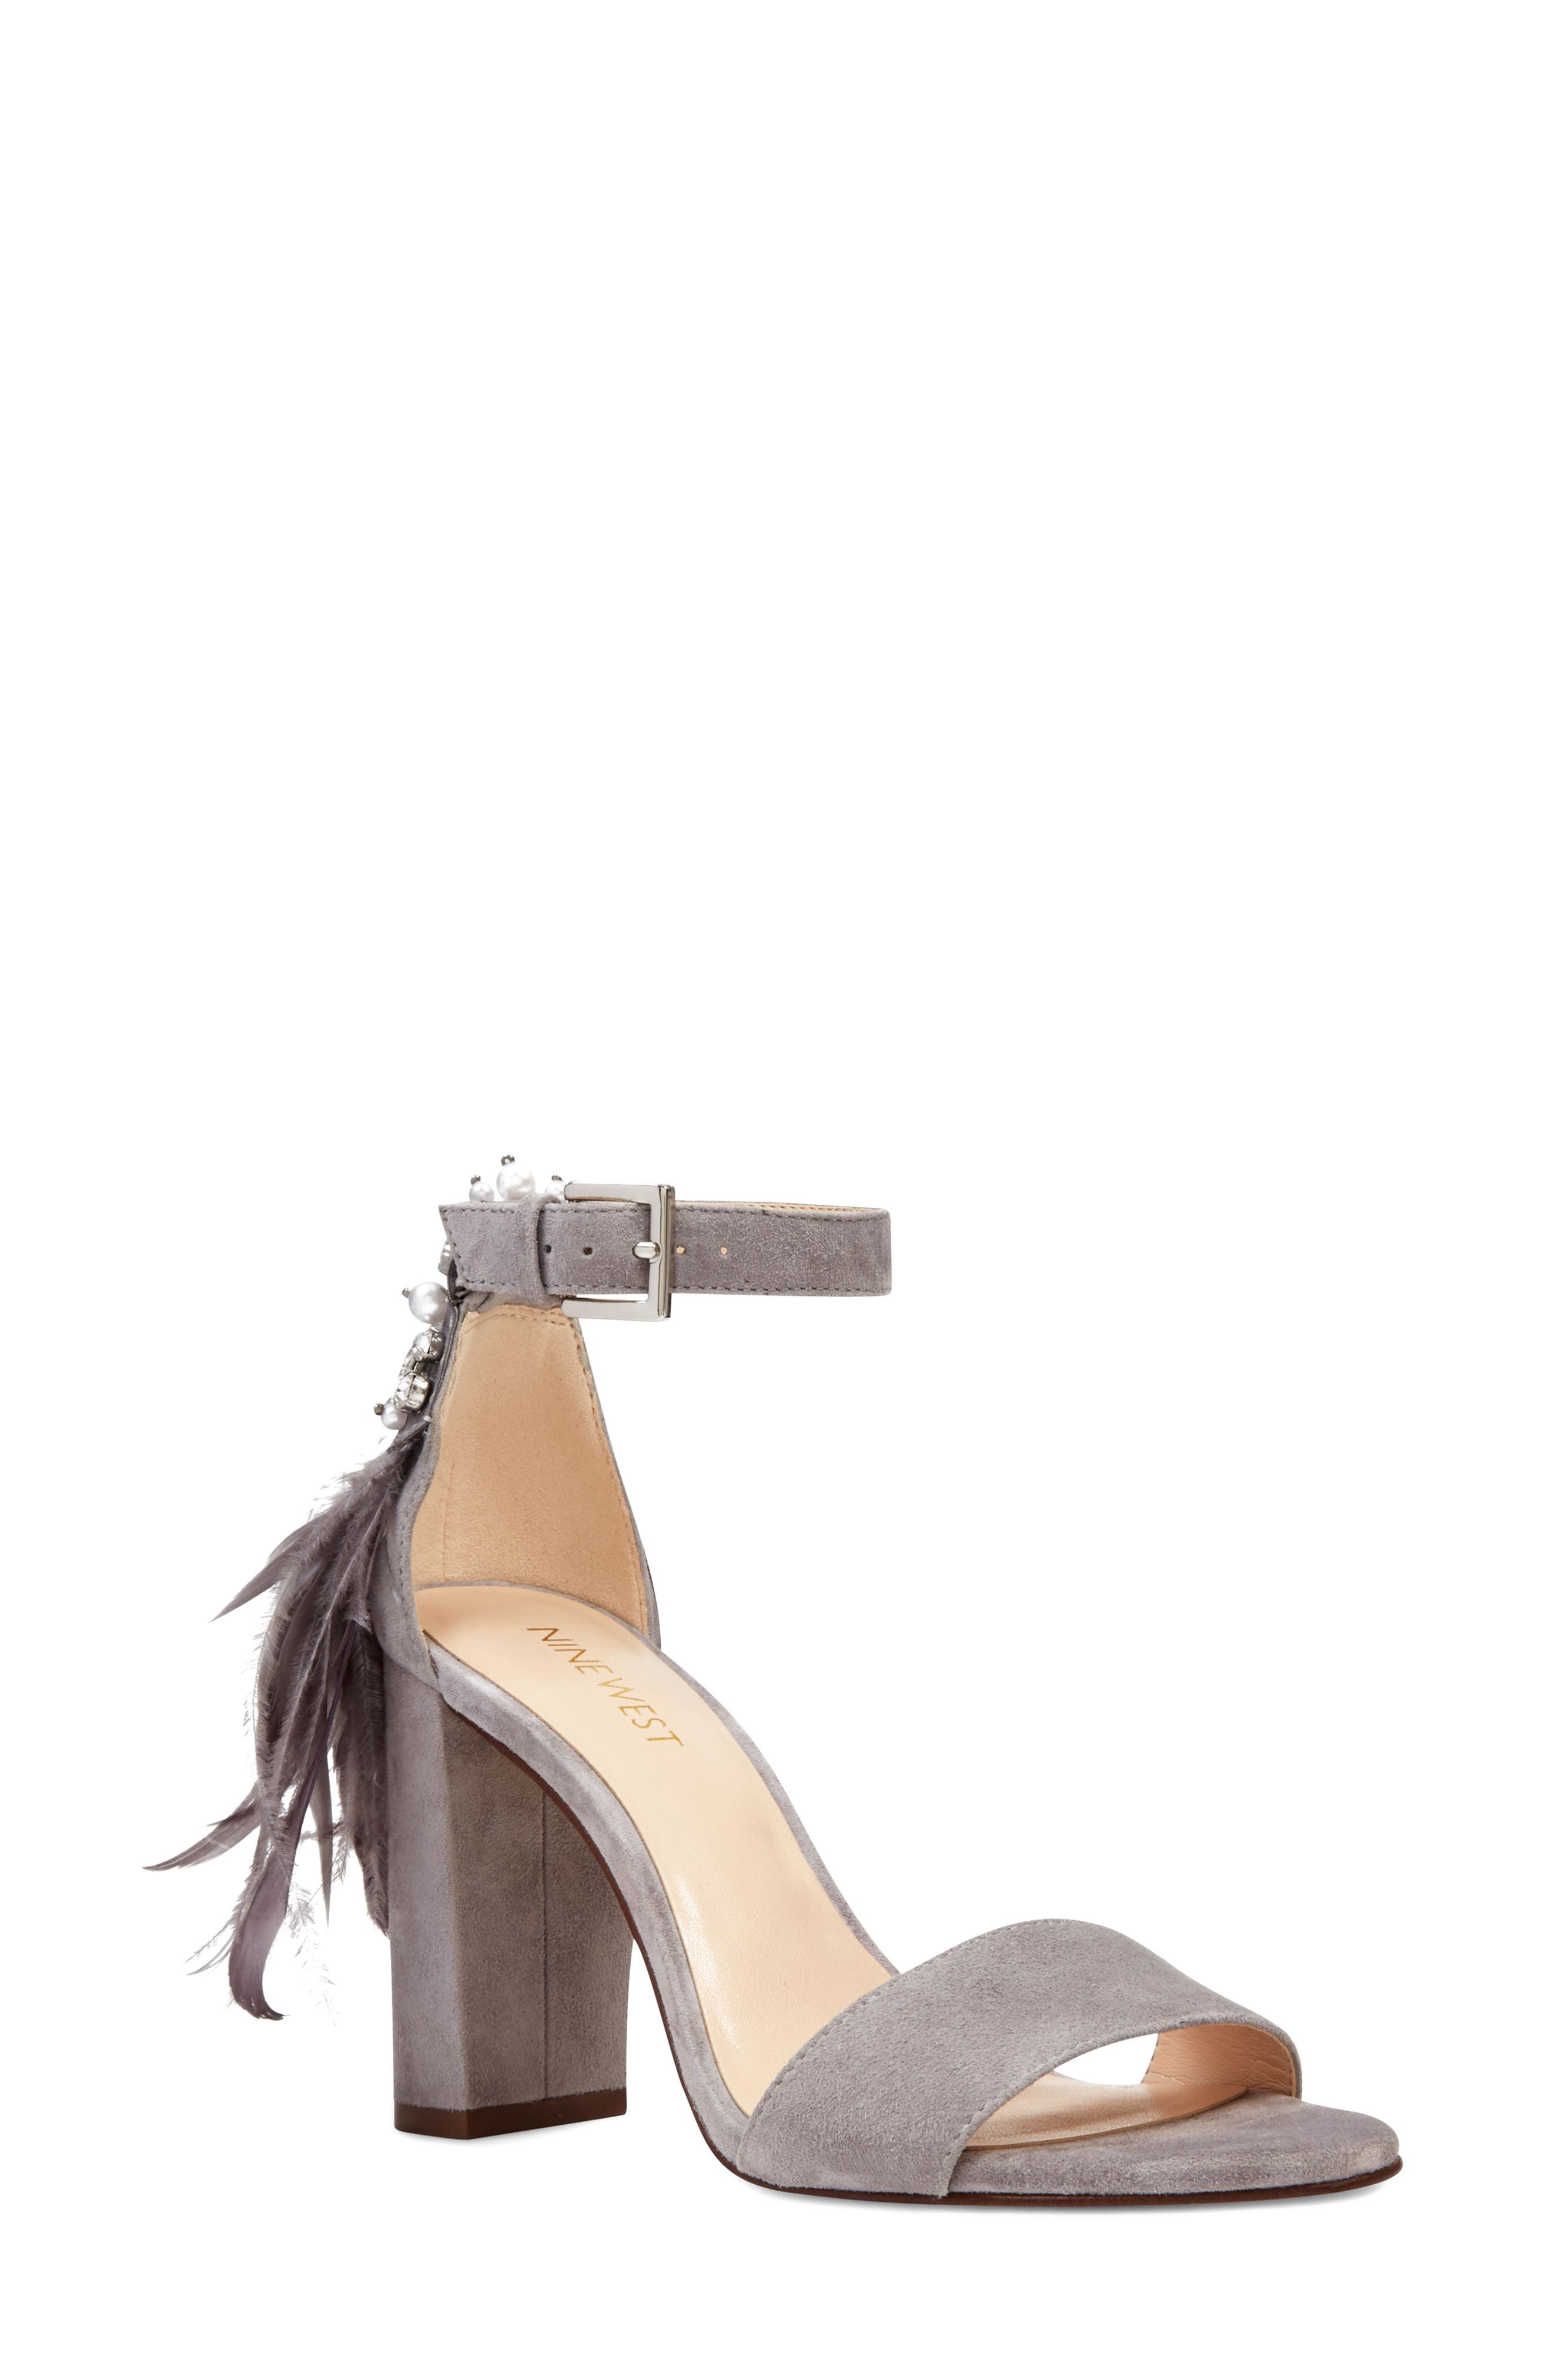 Aaronita Feather Block Heel Sandal,                             Main thumbnail 1, color,                             Grey Suede